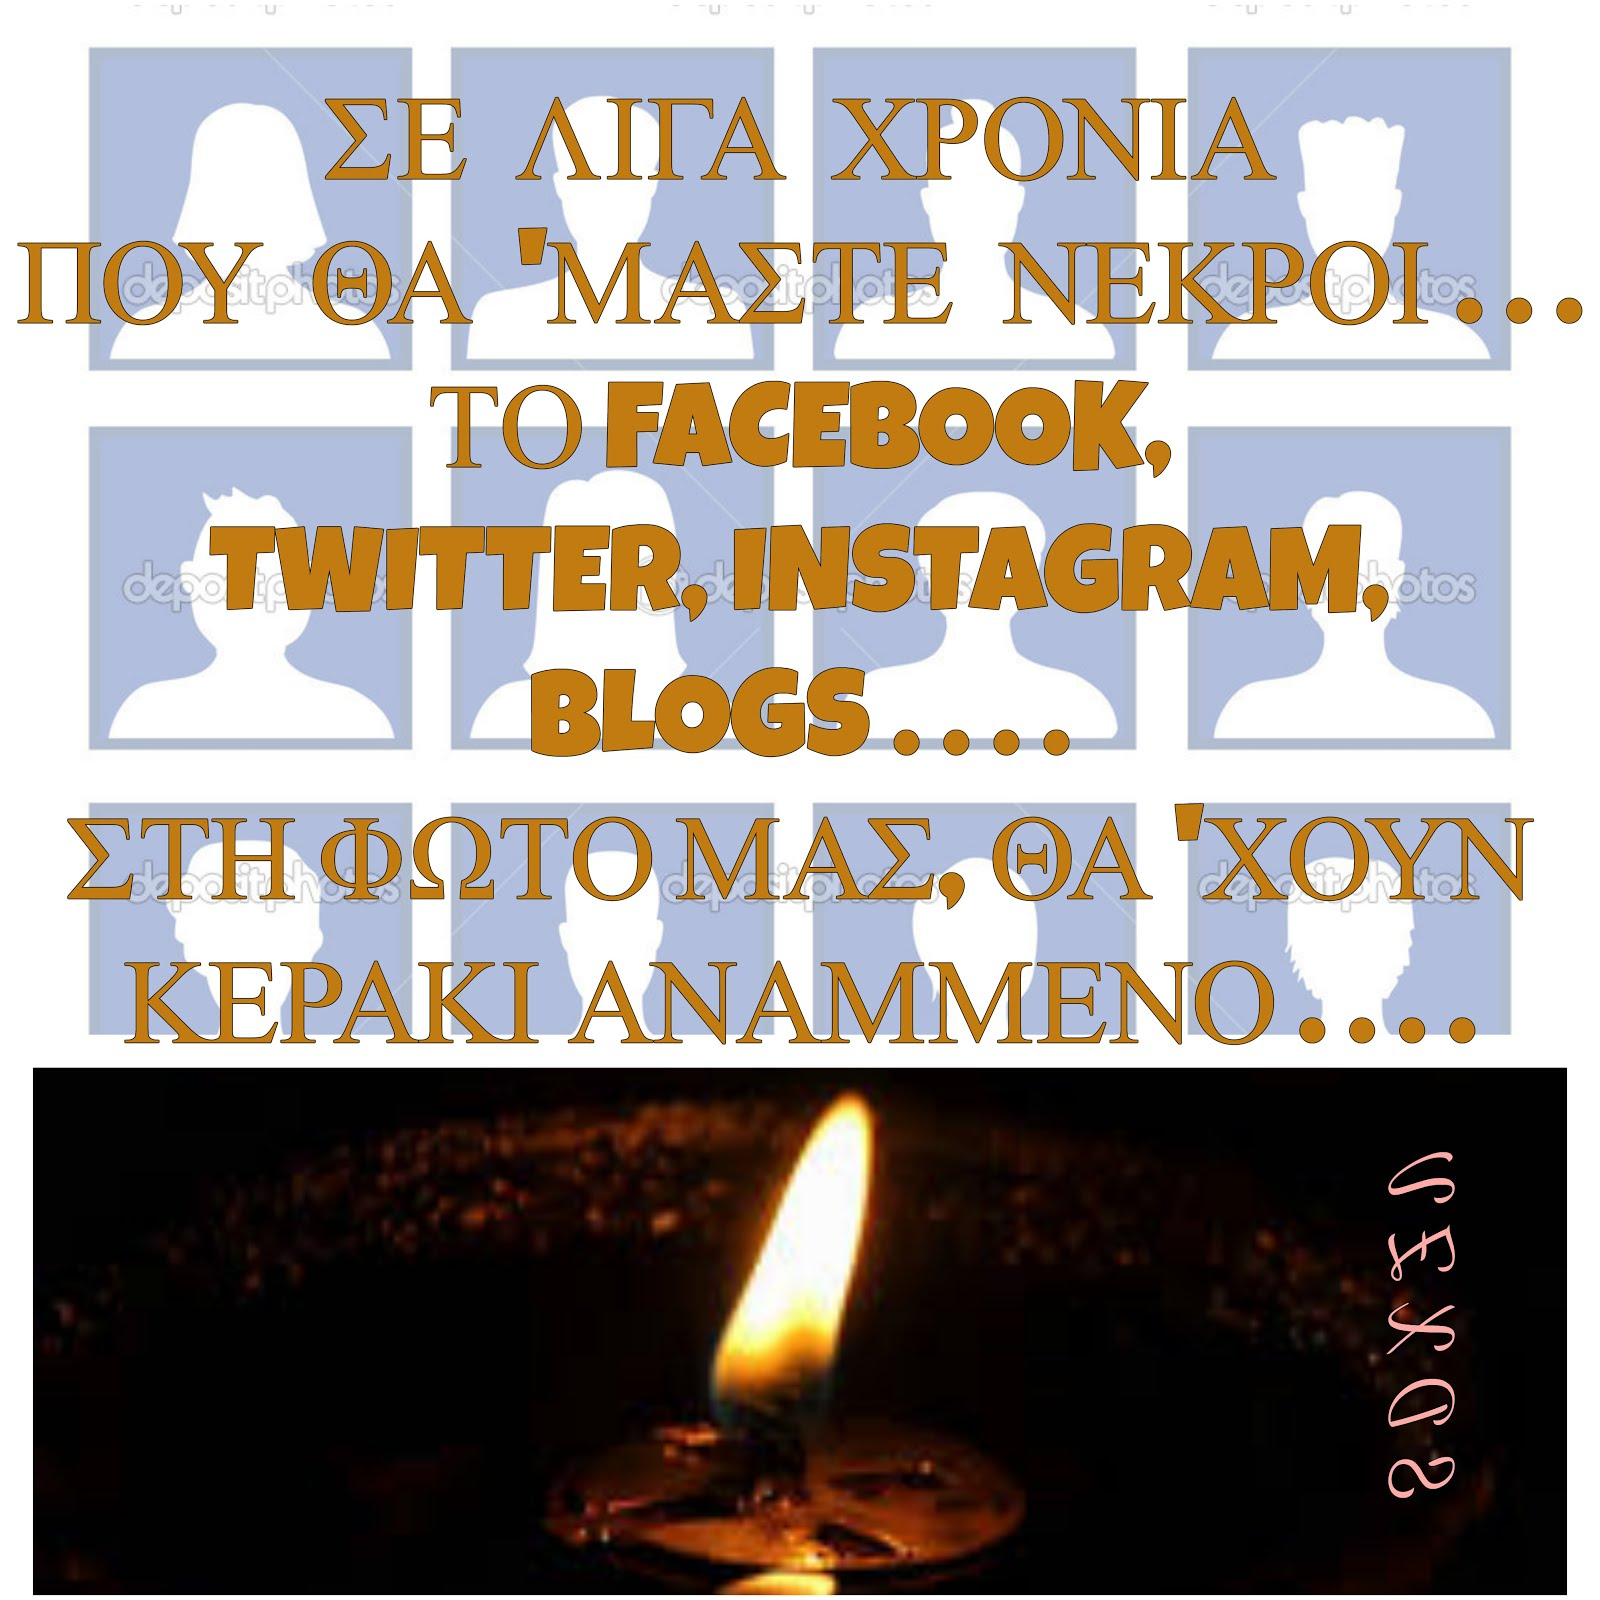 Dead profile - sosial media